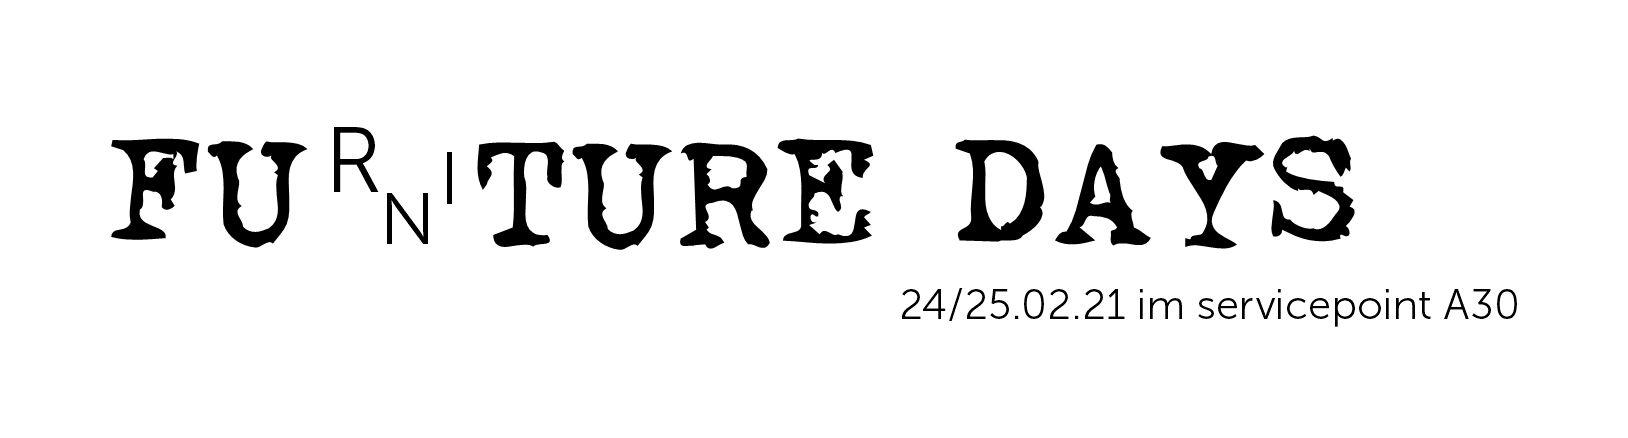 Furniture Days 2021